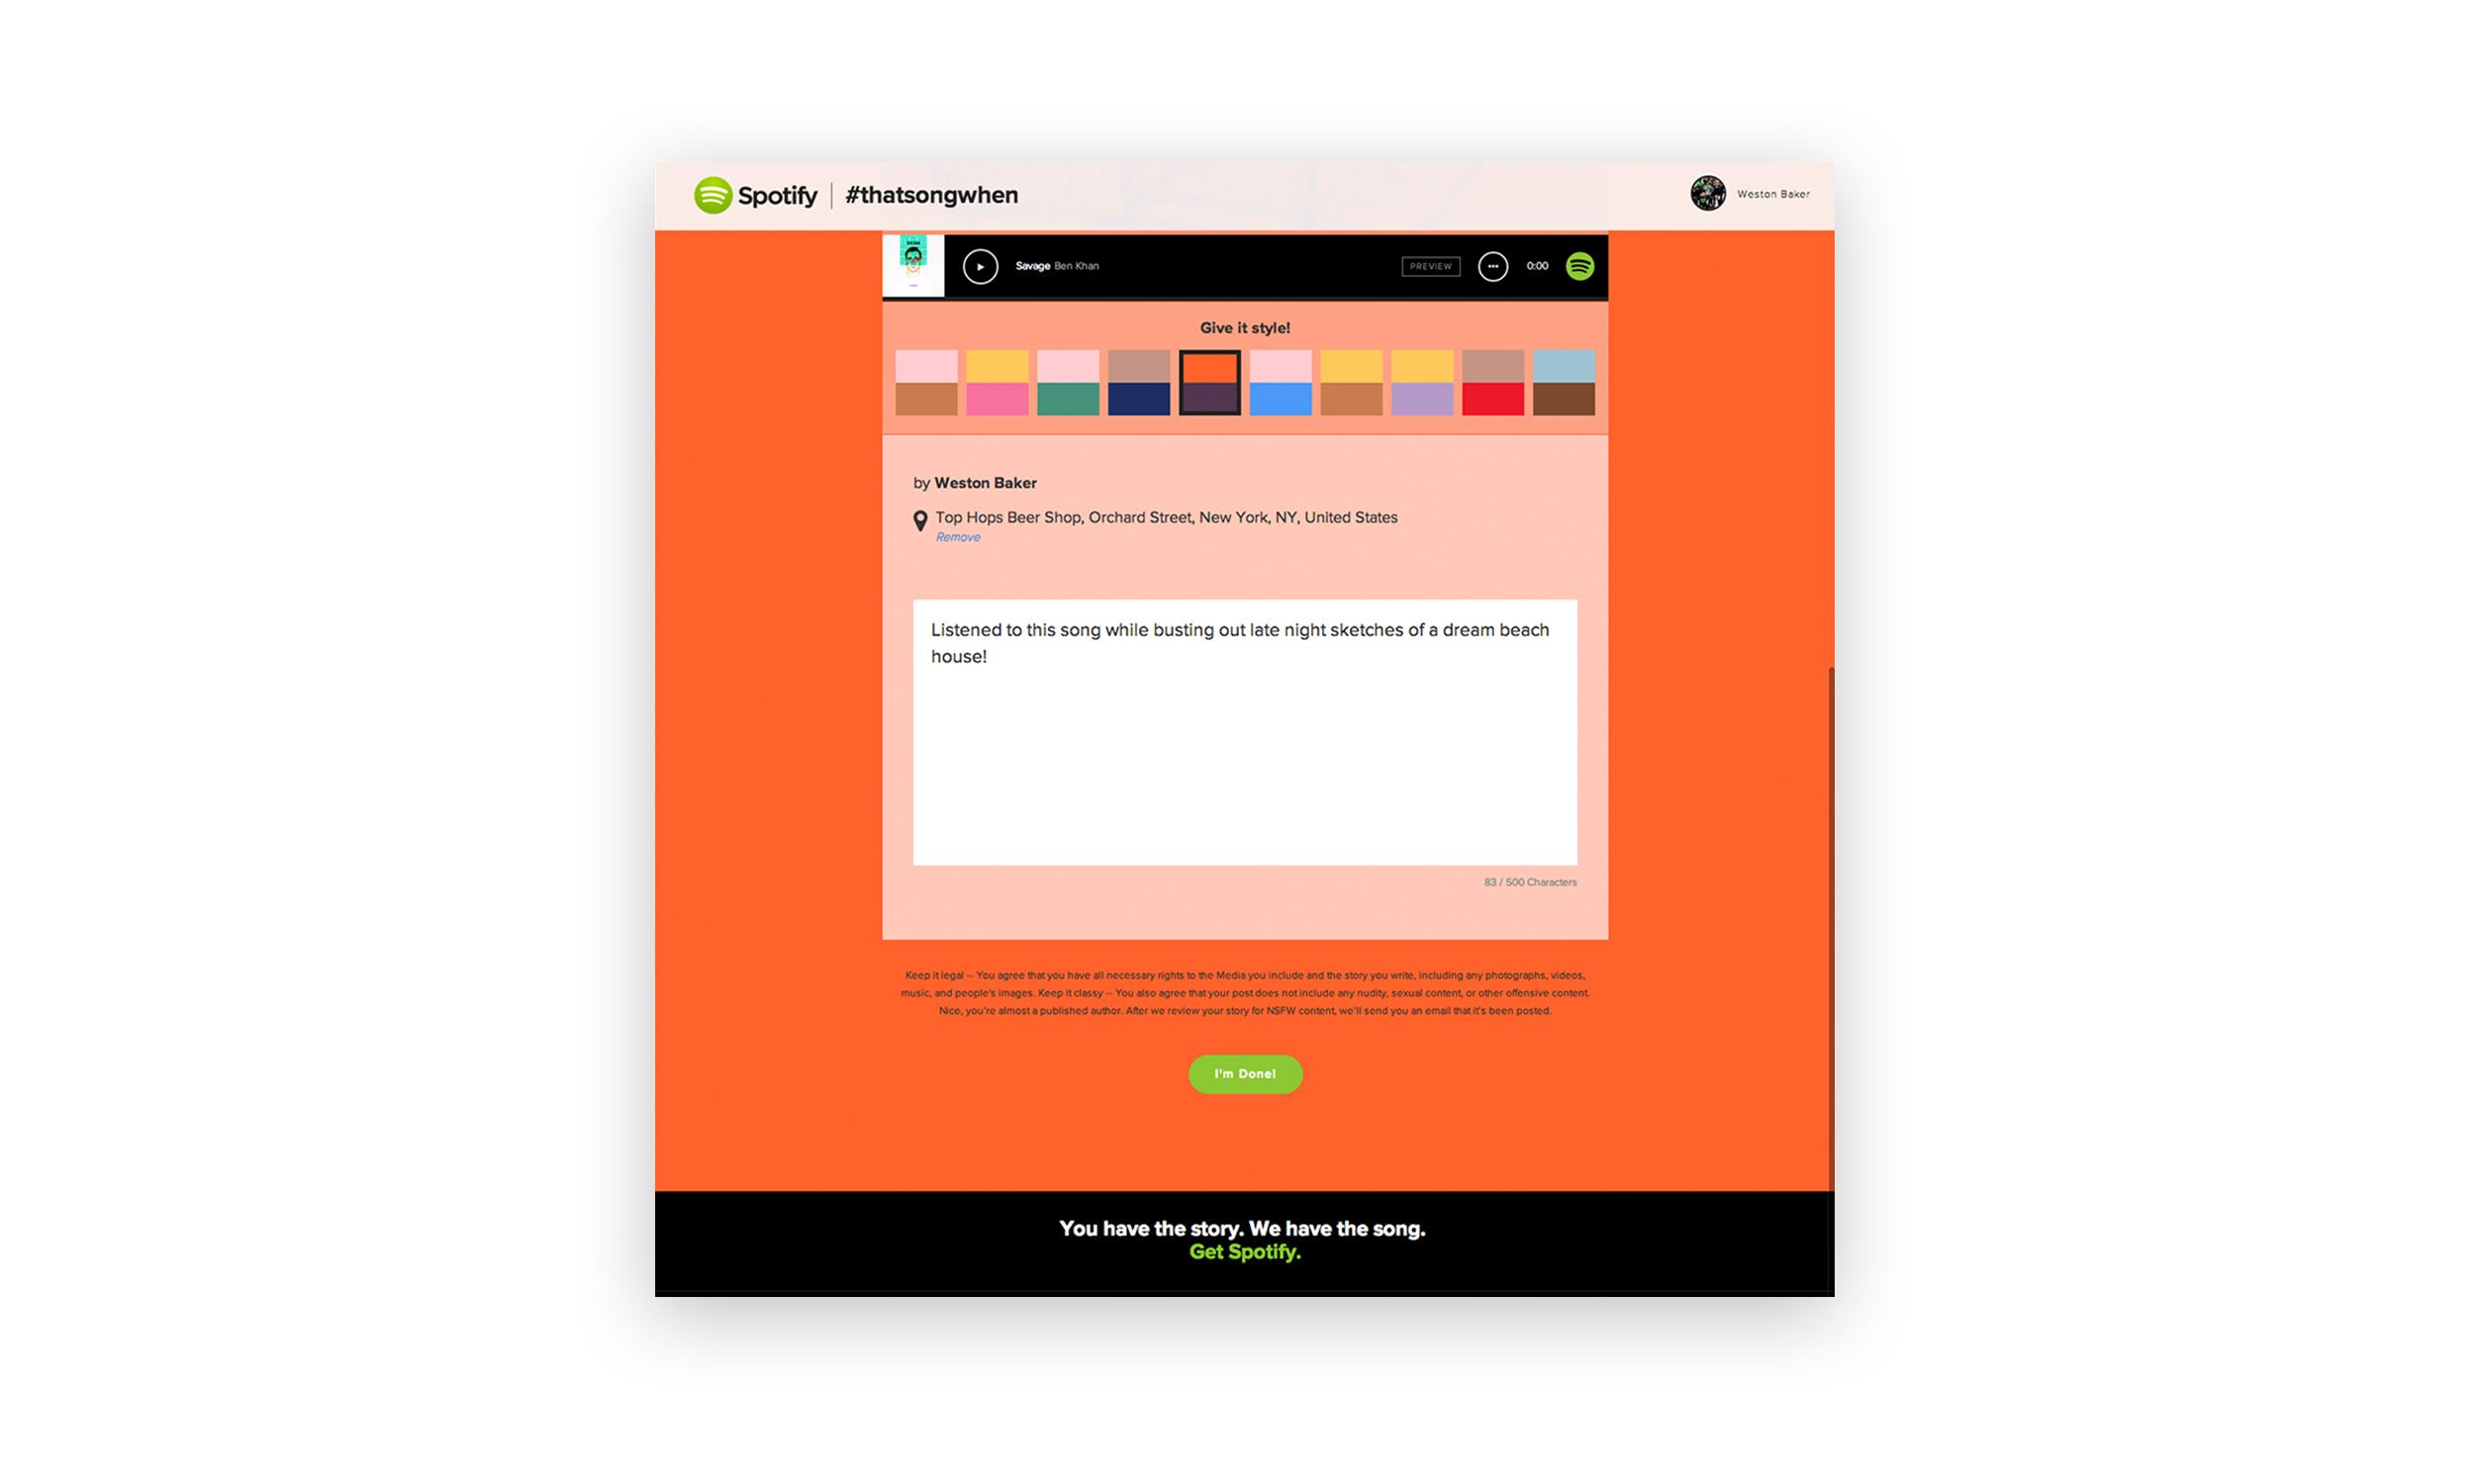 Spotify-thatsongwhen-screens9.jpg